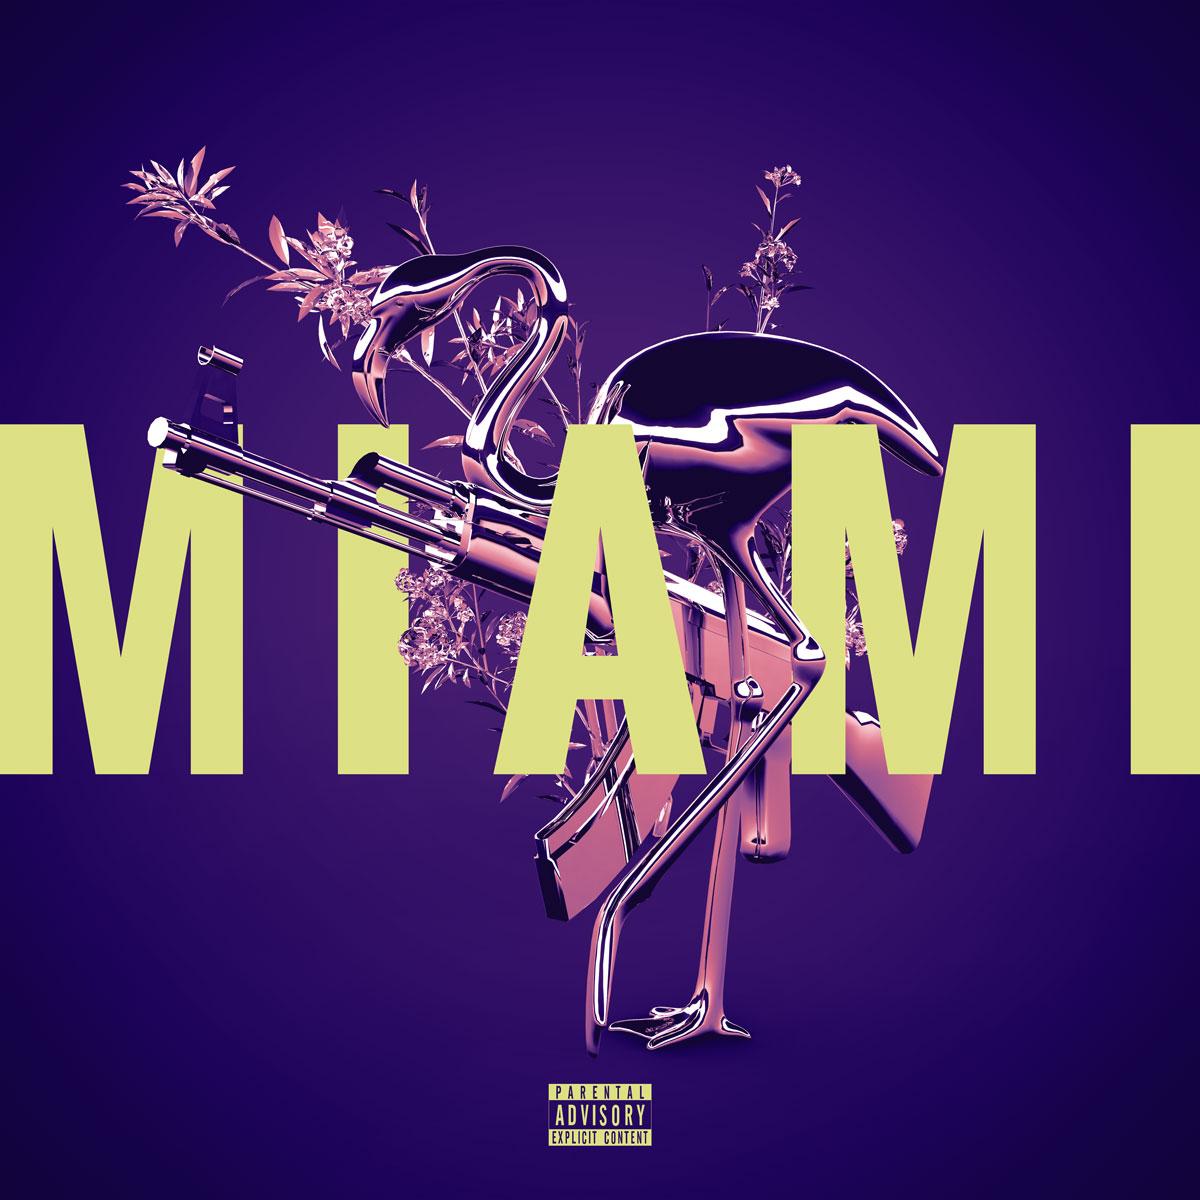 Miami single artwork